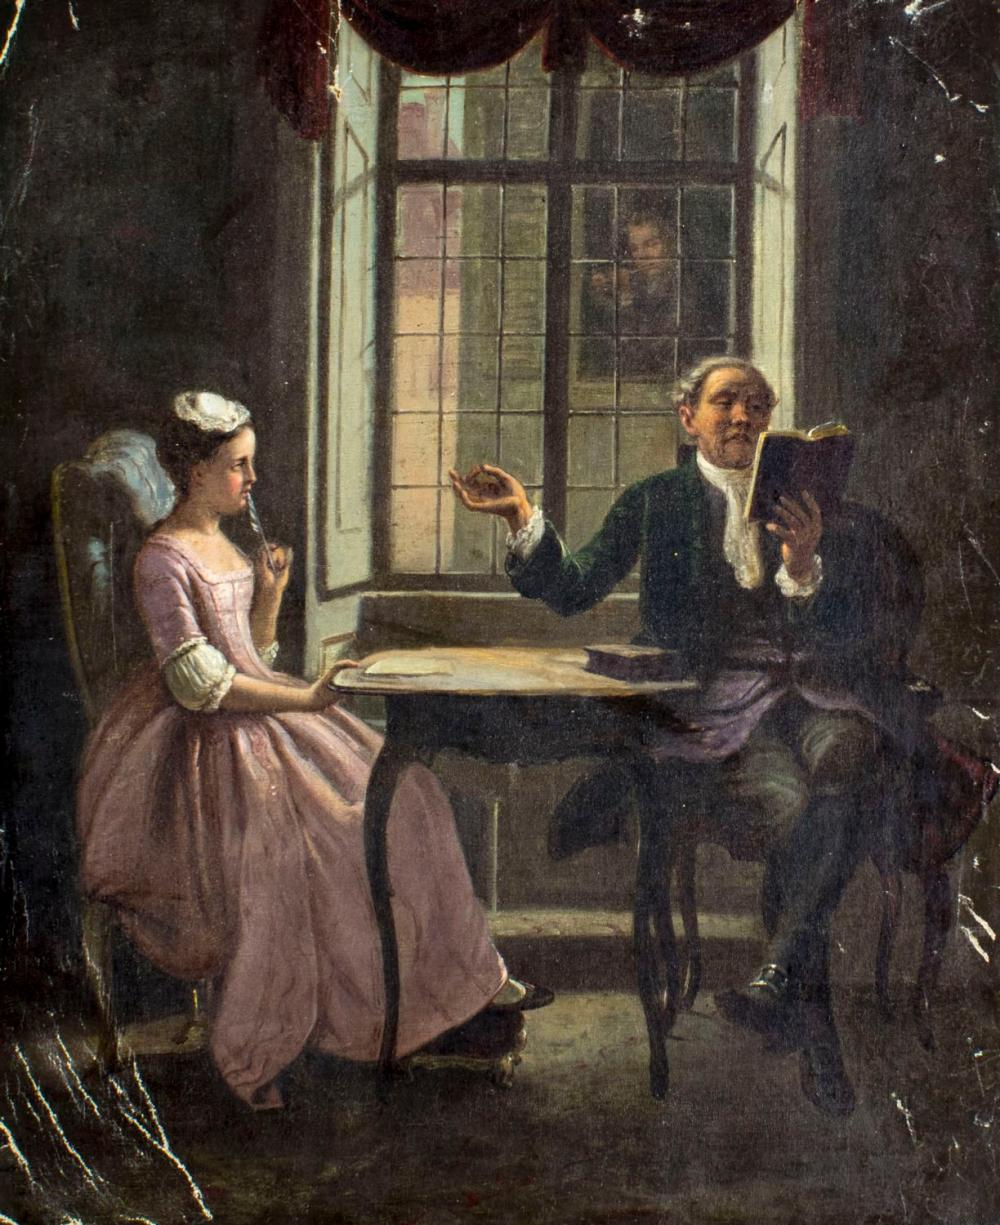 ATTR Evert Jan Boks (Dutch,1838-1914) oil painting antique